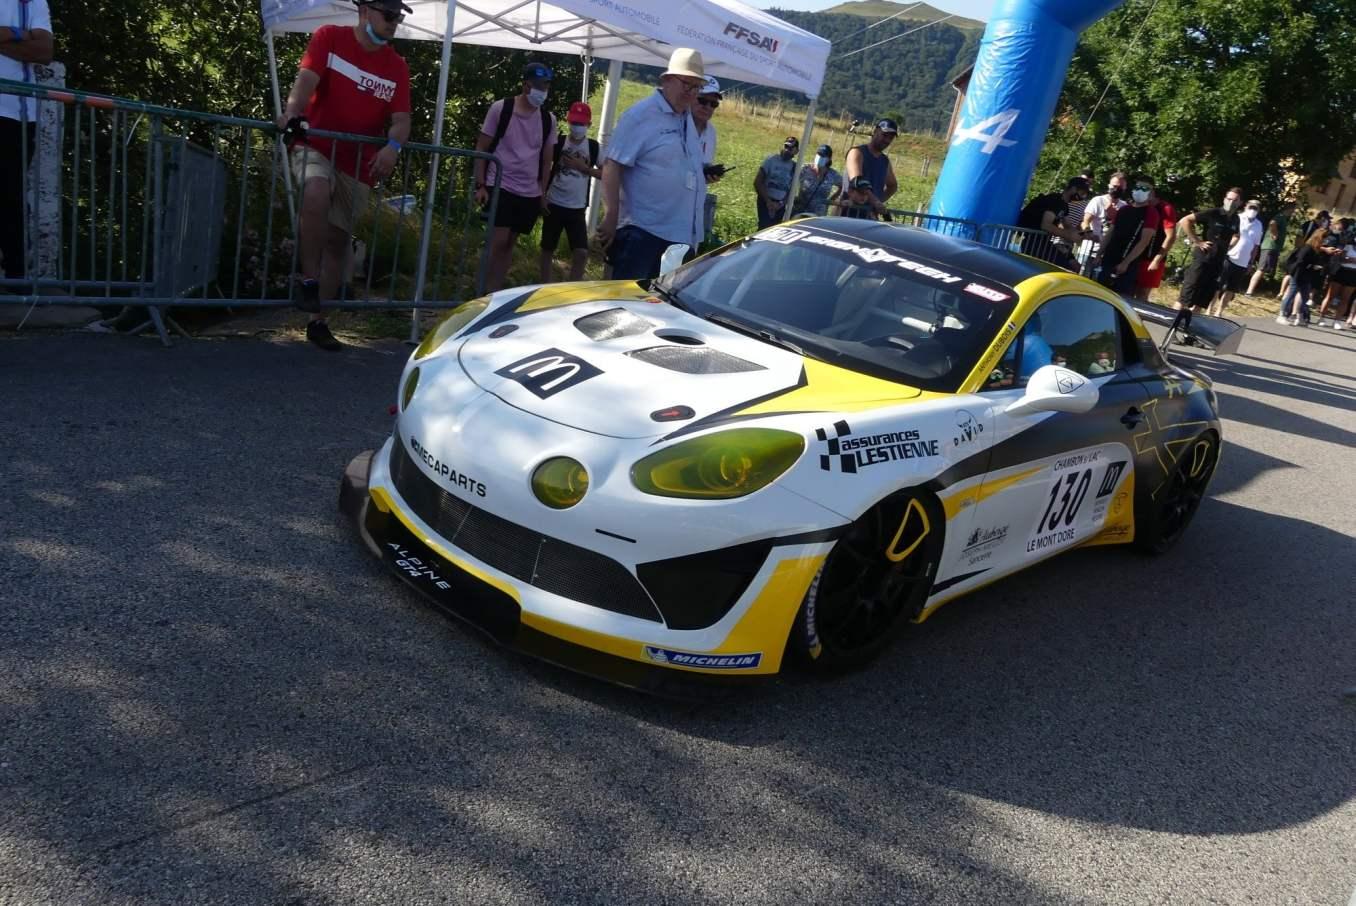 Anthony Dubois Alpine A110 GT4 Course cote 2020 3 | Anthony Dubois, pilote d'une Alpine A110 engagée en course de côte